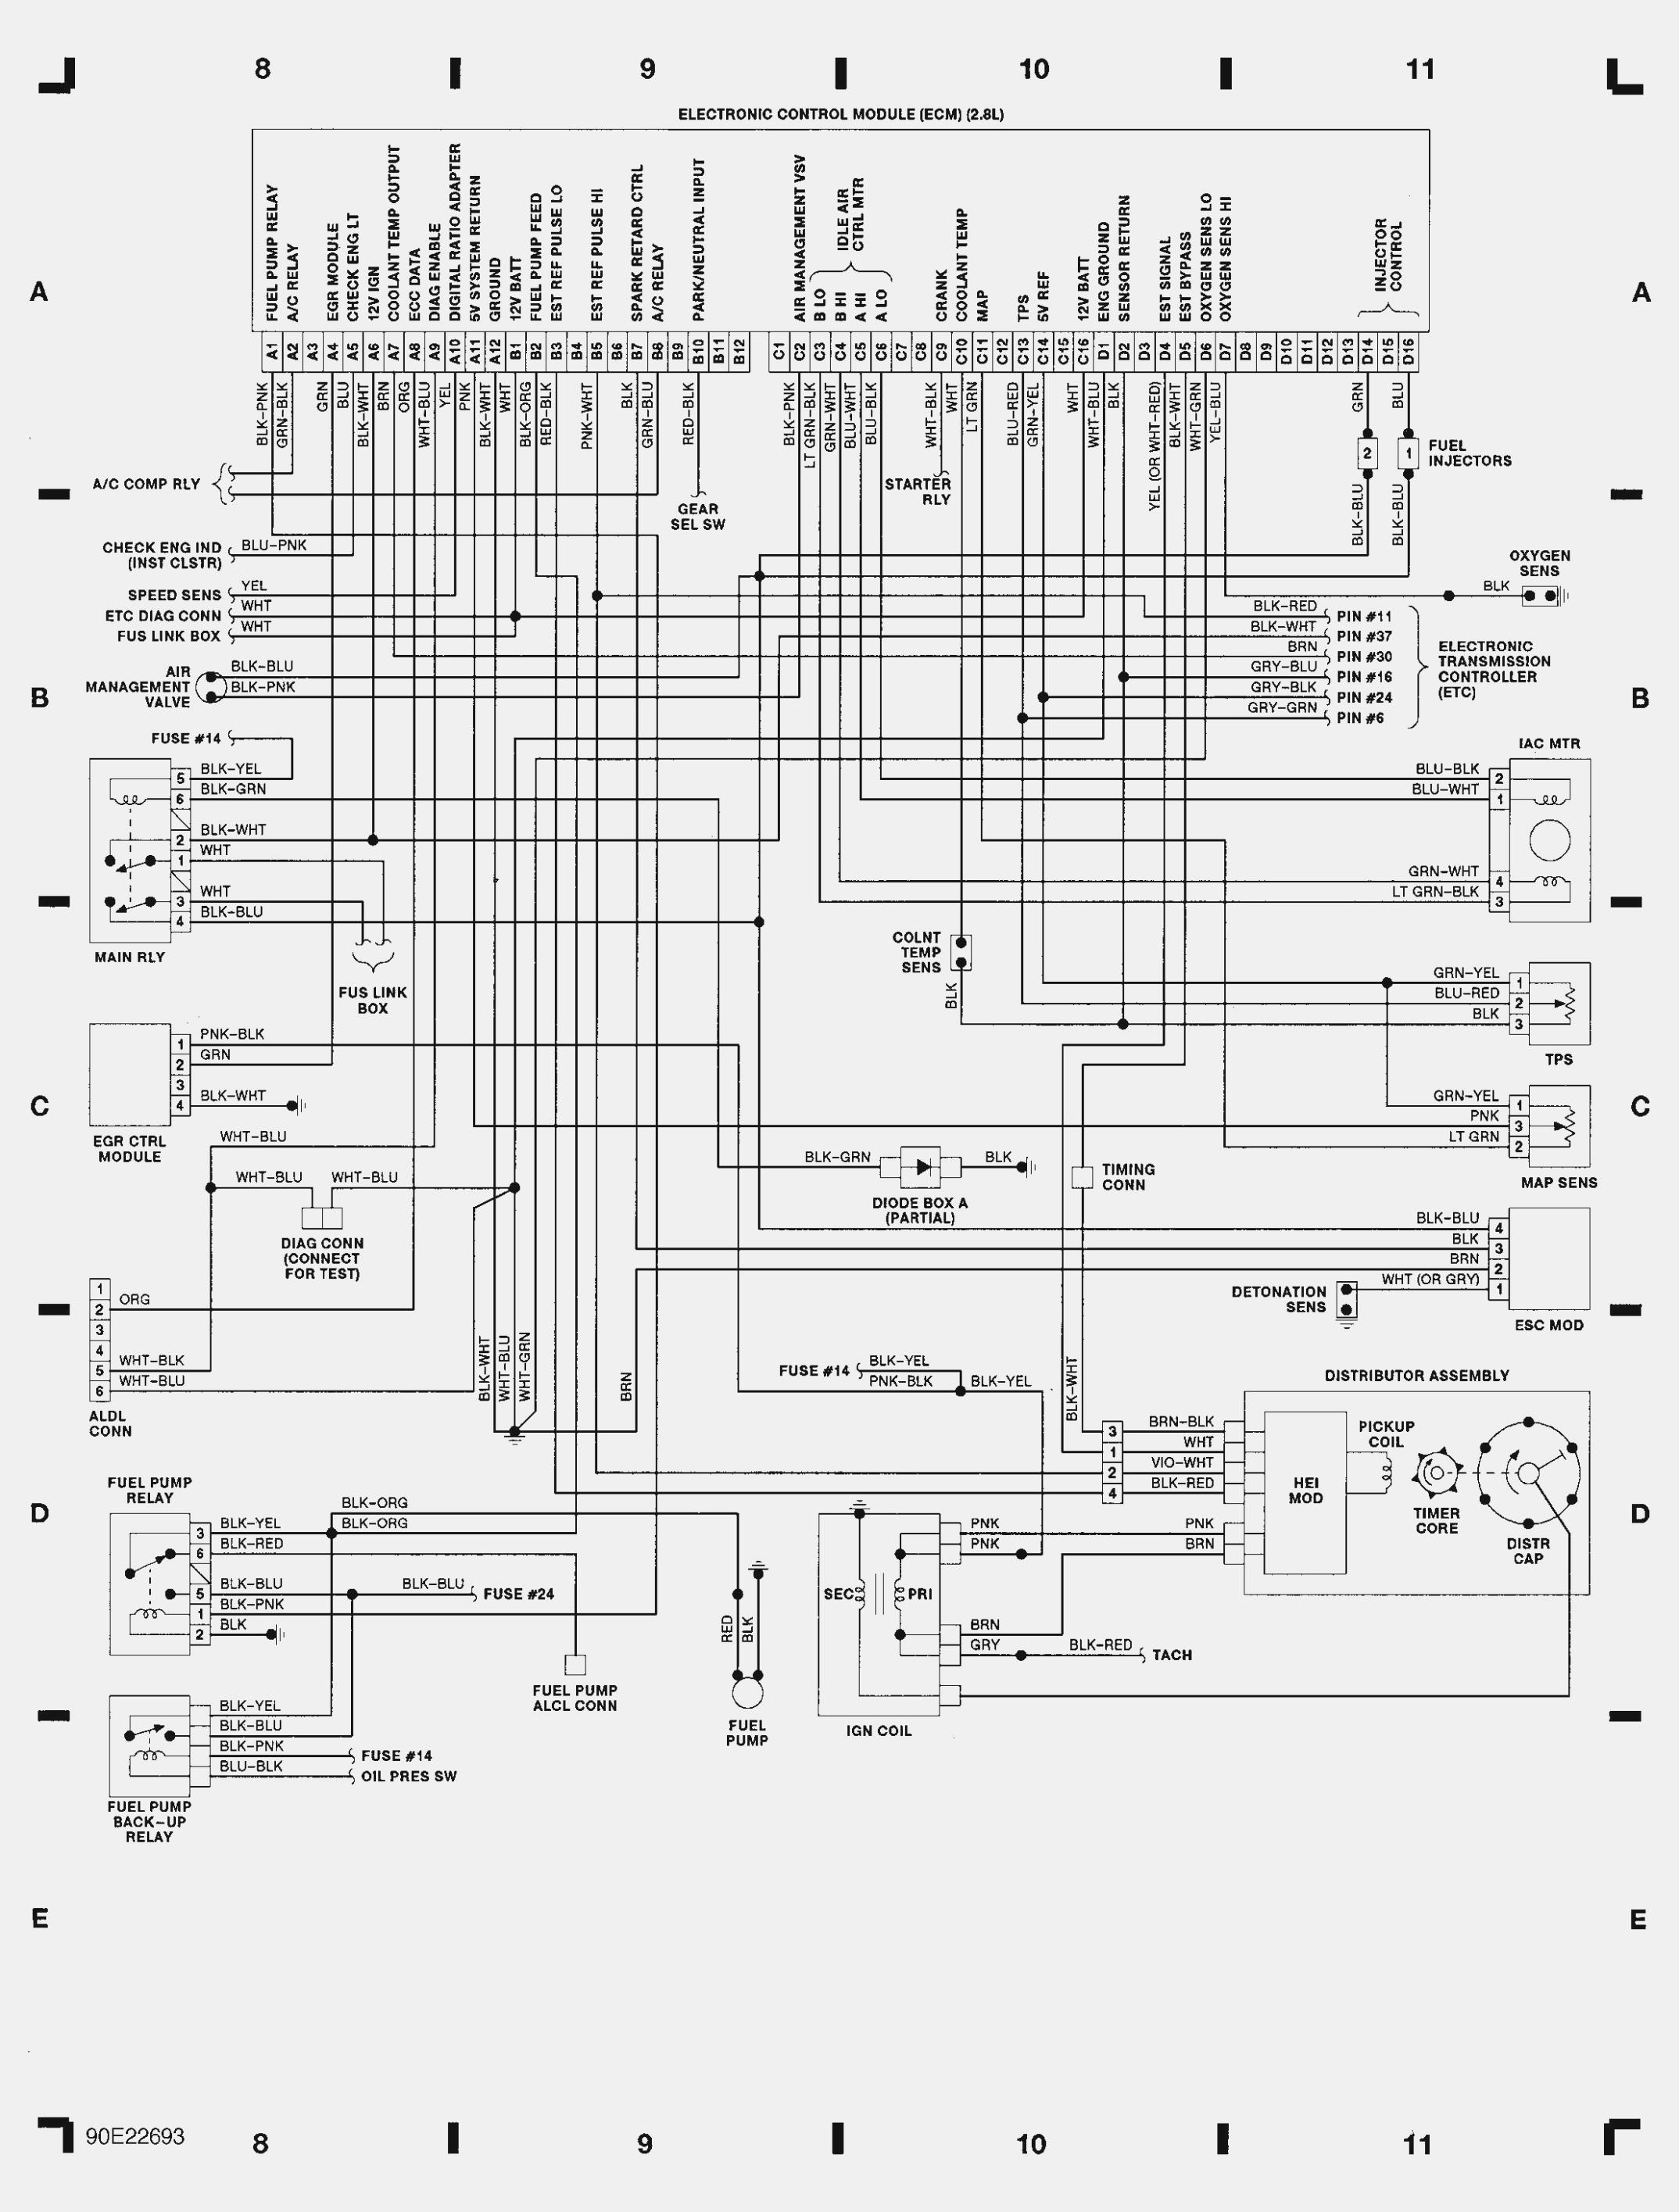 Groovy Isuzu Sportivo Fuse Box Basic Electronics Wiring Diagram Wiring Cloud Orsalboapumohammedshrineorg